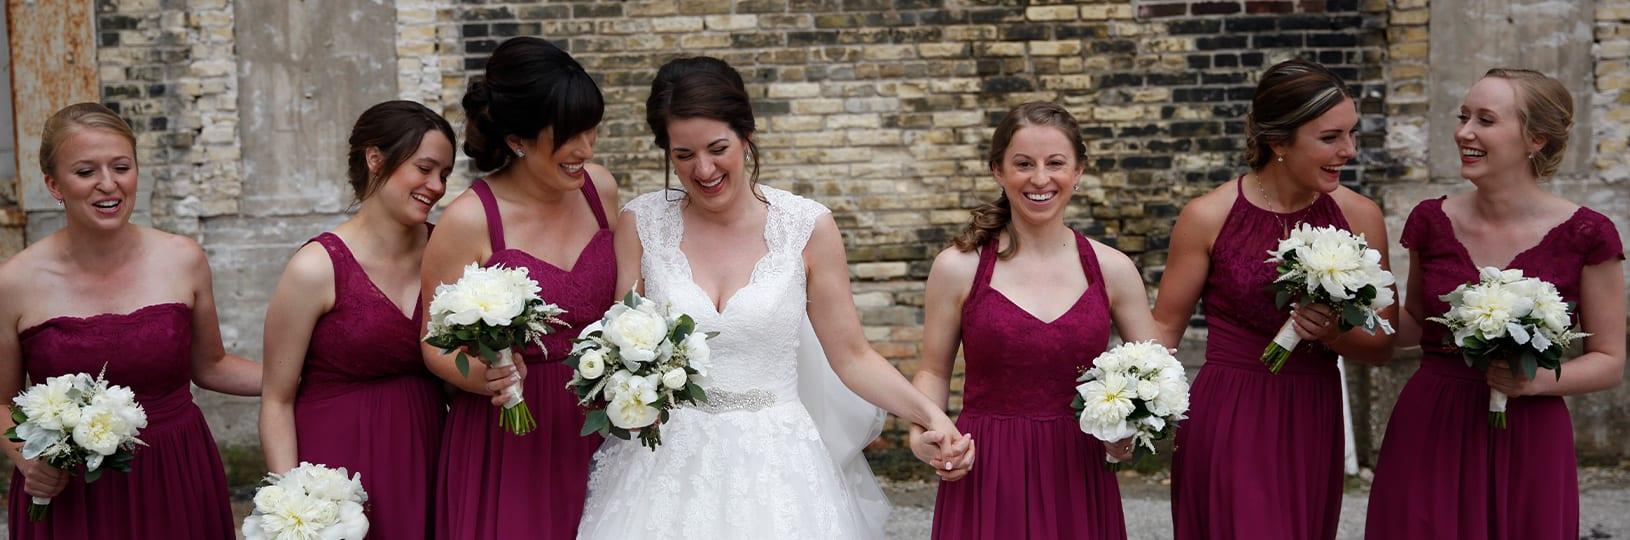 Matching bridesmaid jewelry.